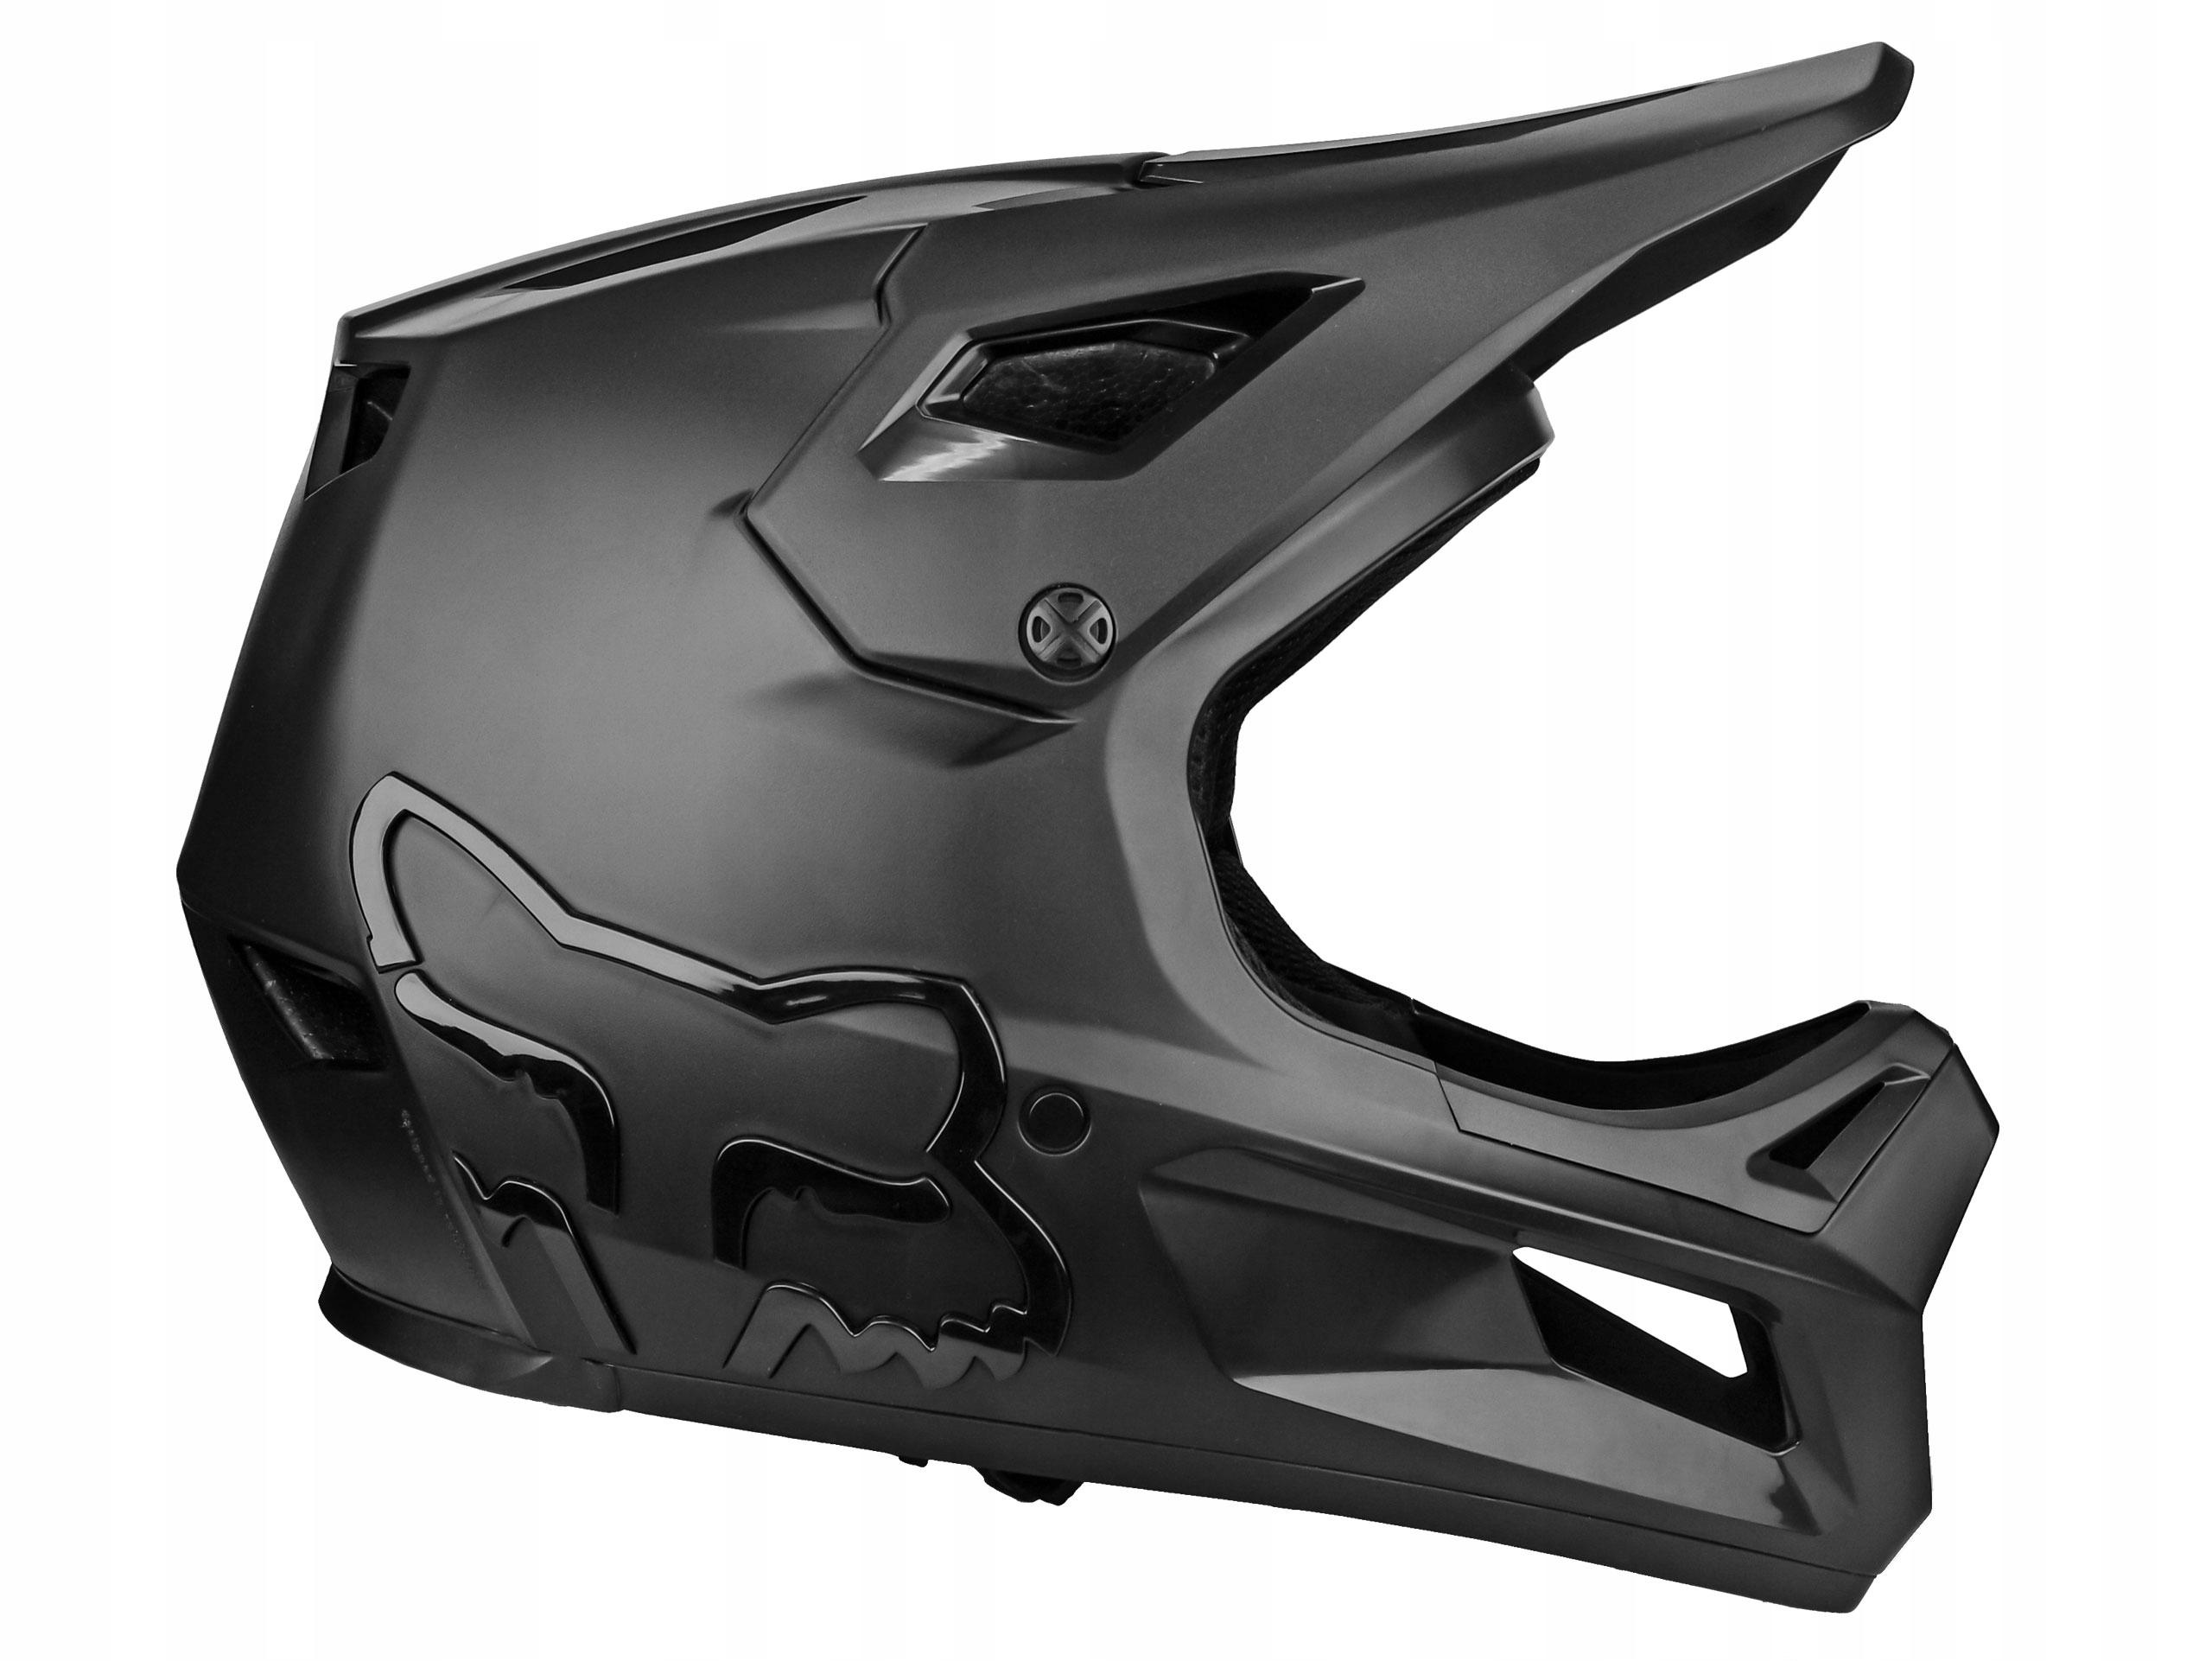 KASK ROWEROWY FOX RAMPAGE MIPS BLACK 57-58 CM / M Model RAMPAGE HLMT